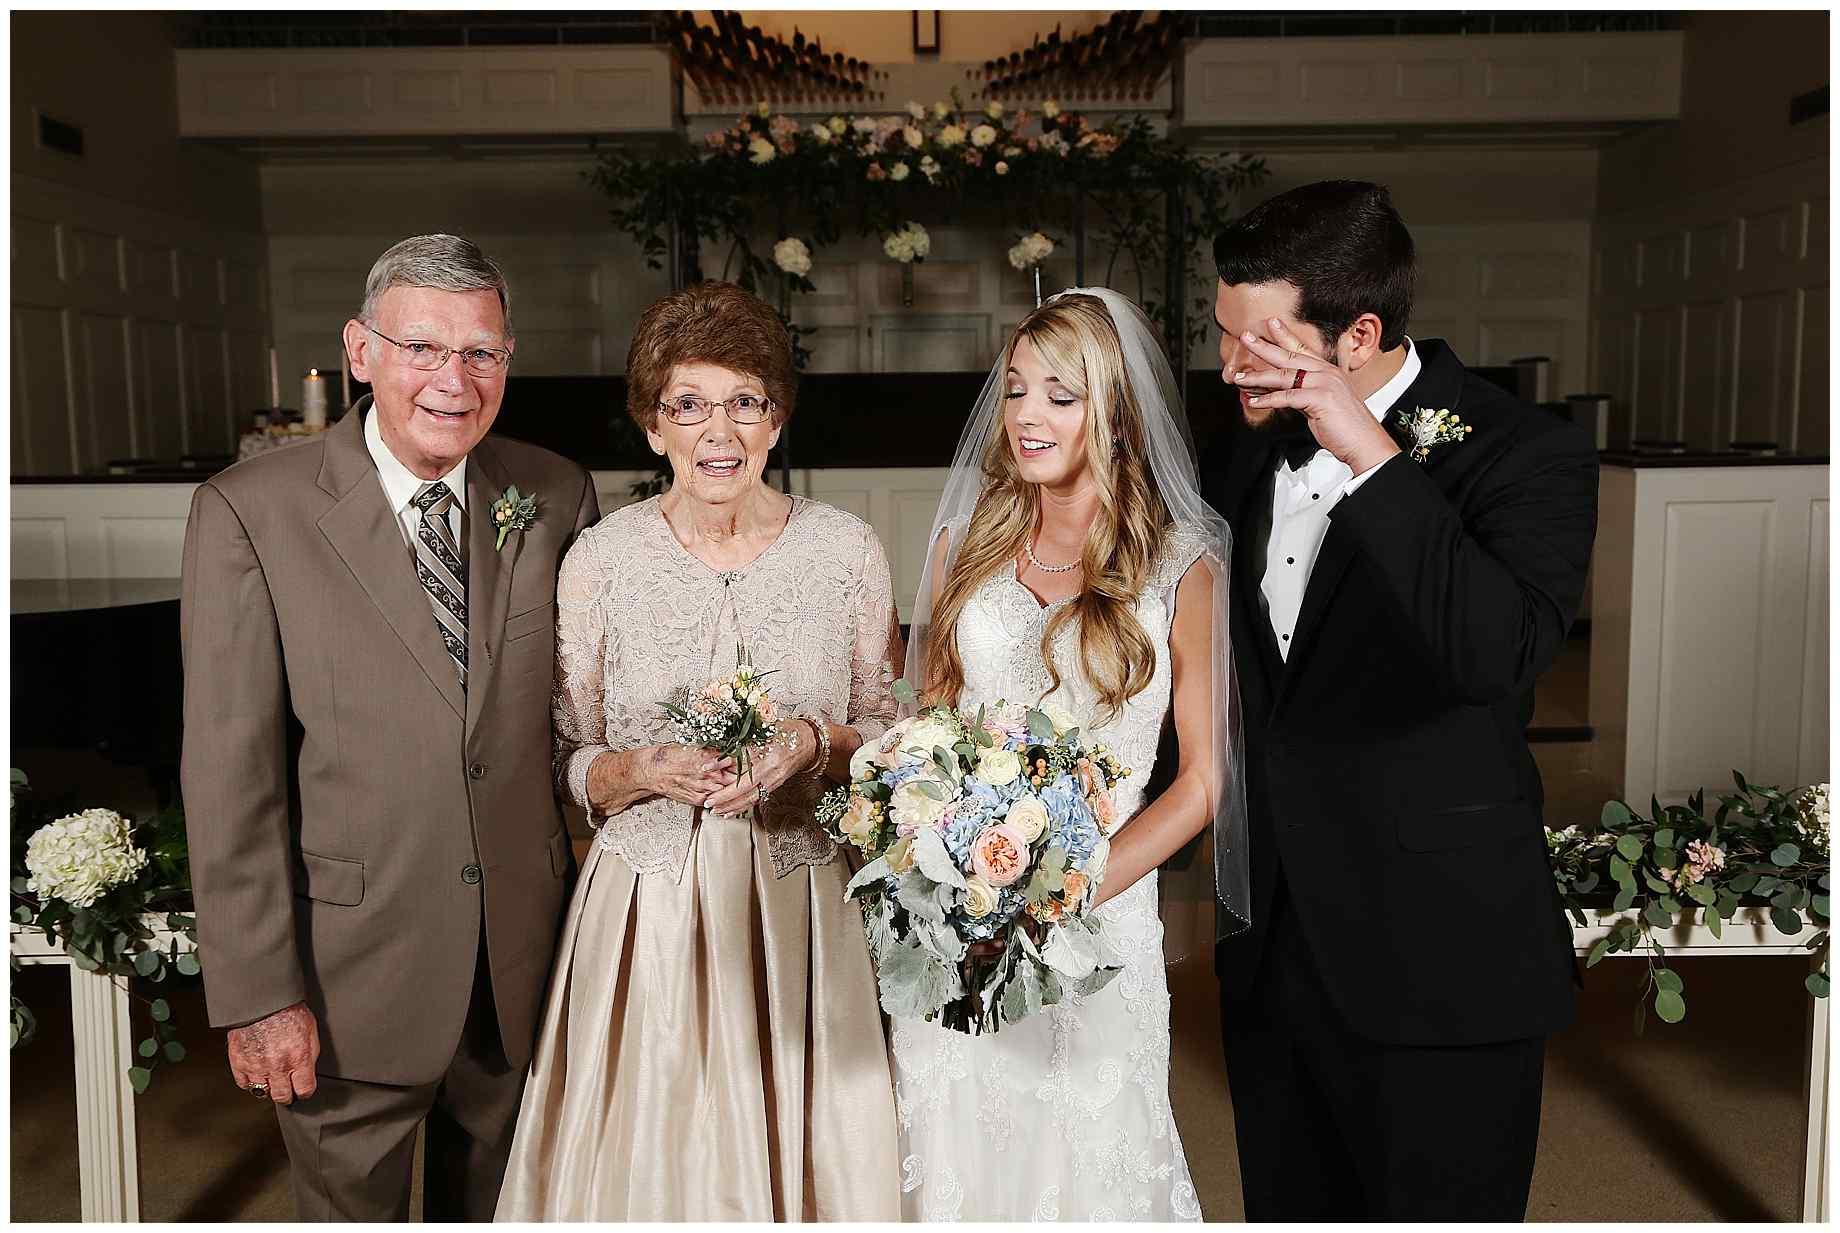 centenary-college-wedding-photos-shreveport-014